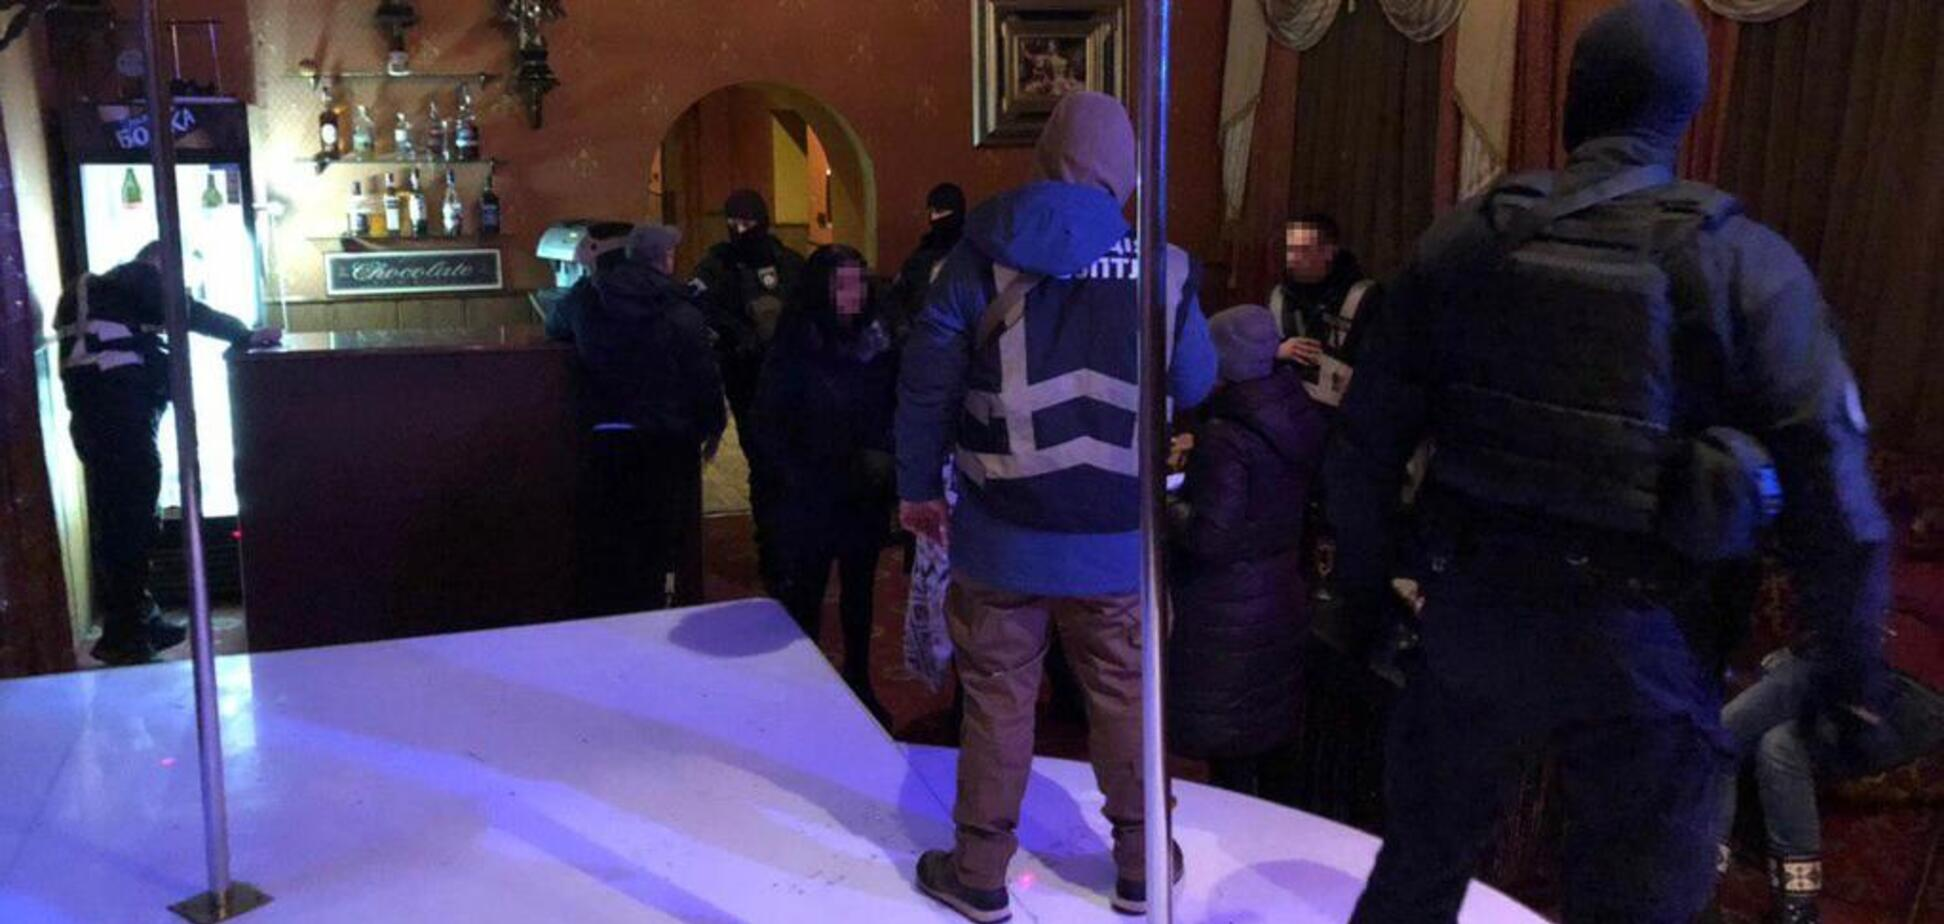 Интим за 600 грн: В Кривом Роге разоблачили бордели в стрип-клубах